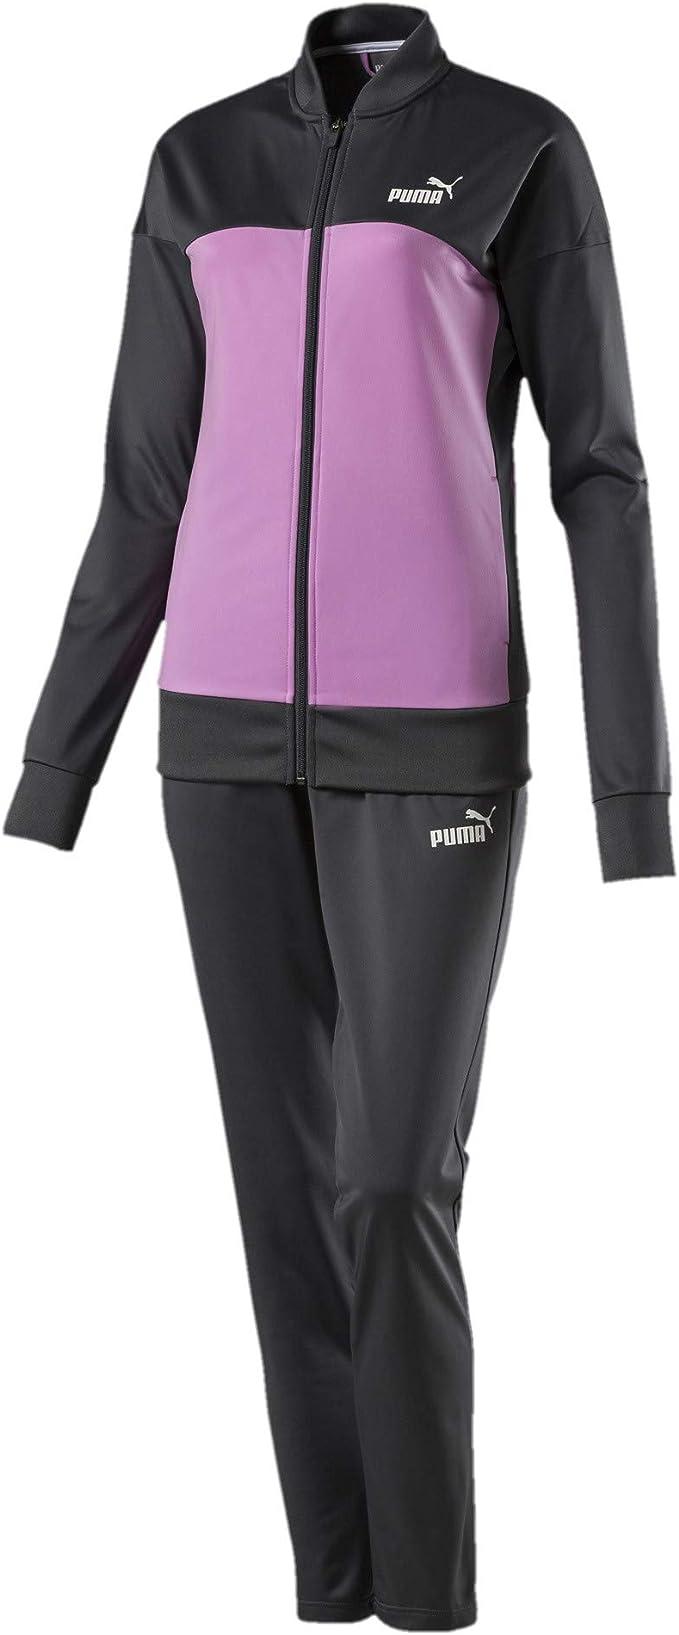 PUMA Damen Classic, Op Trainingsanzug: : Bekleidung